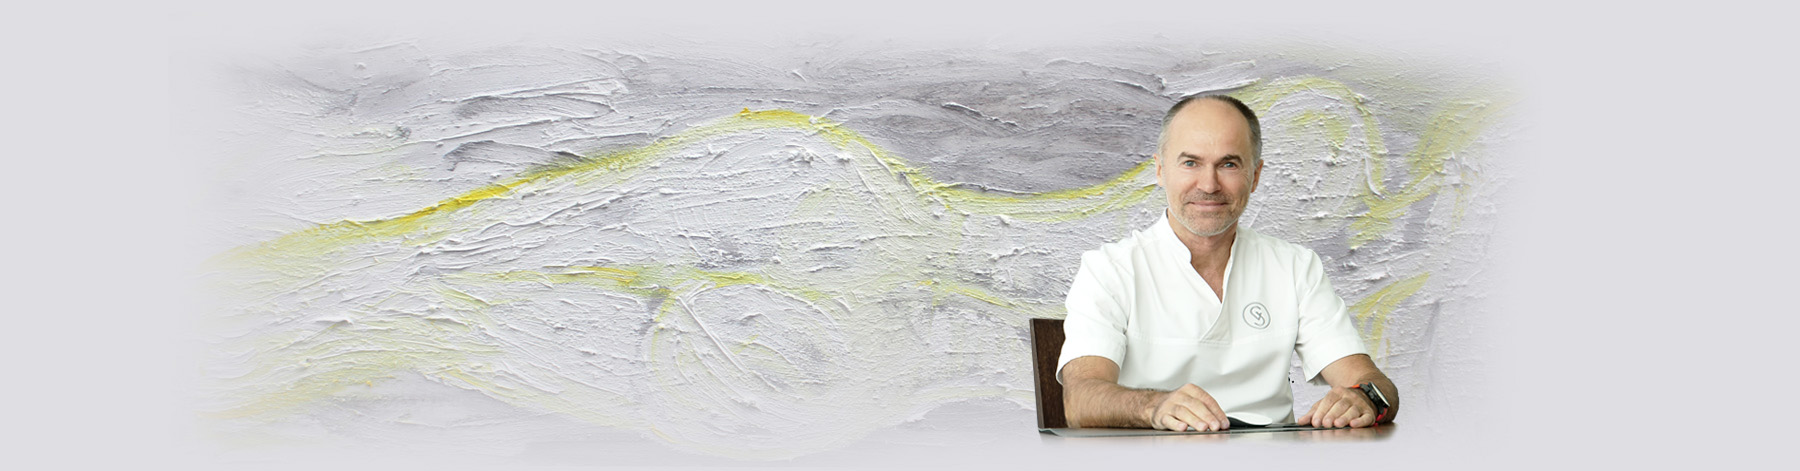 Dr. Saulius Vikšraitis